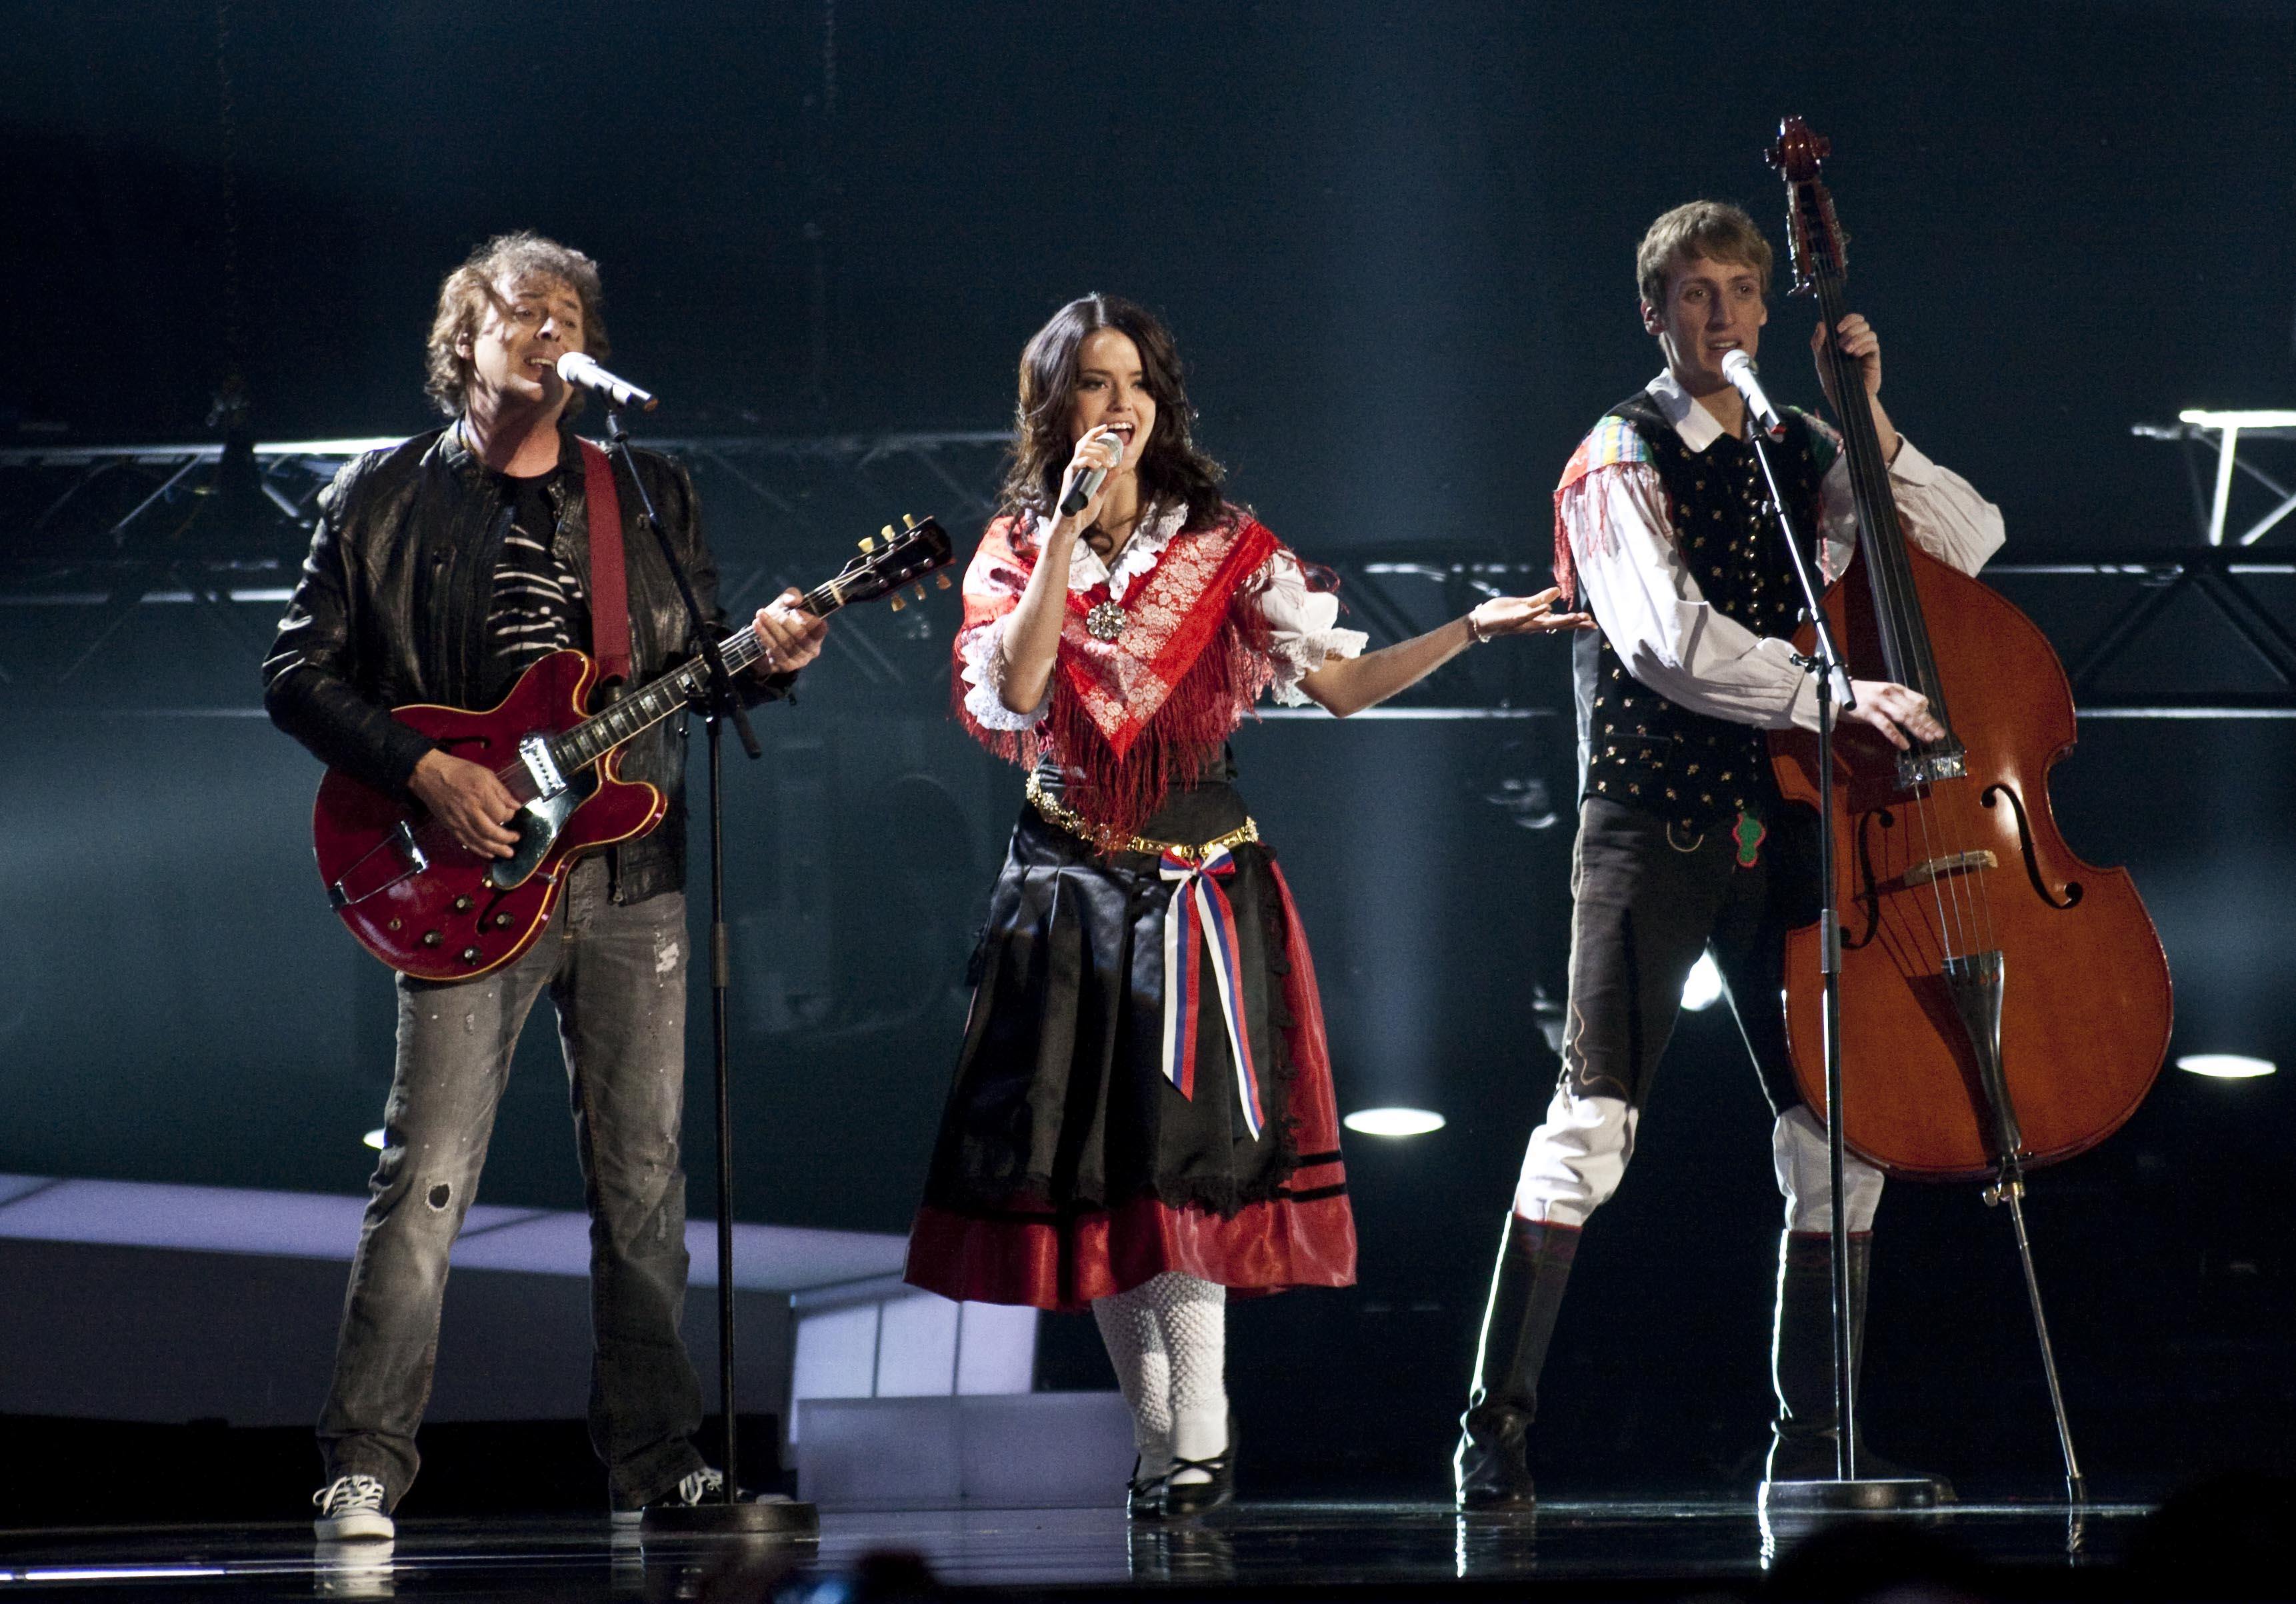 Slovenia_at_Eurovision_2010